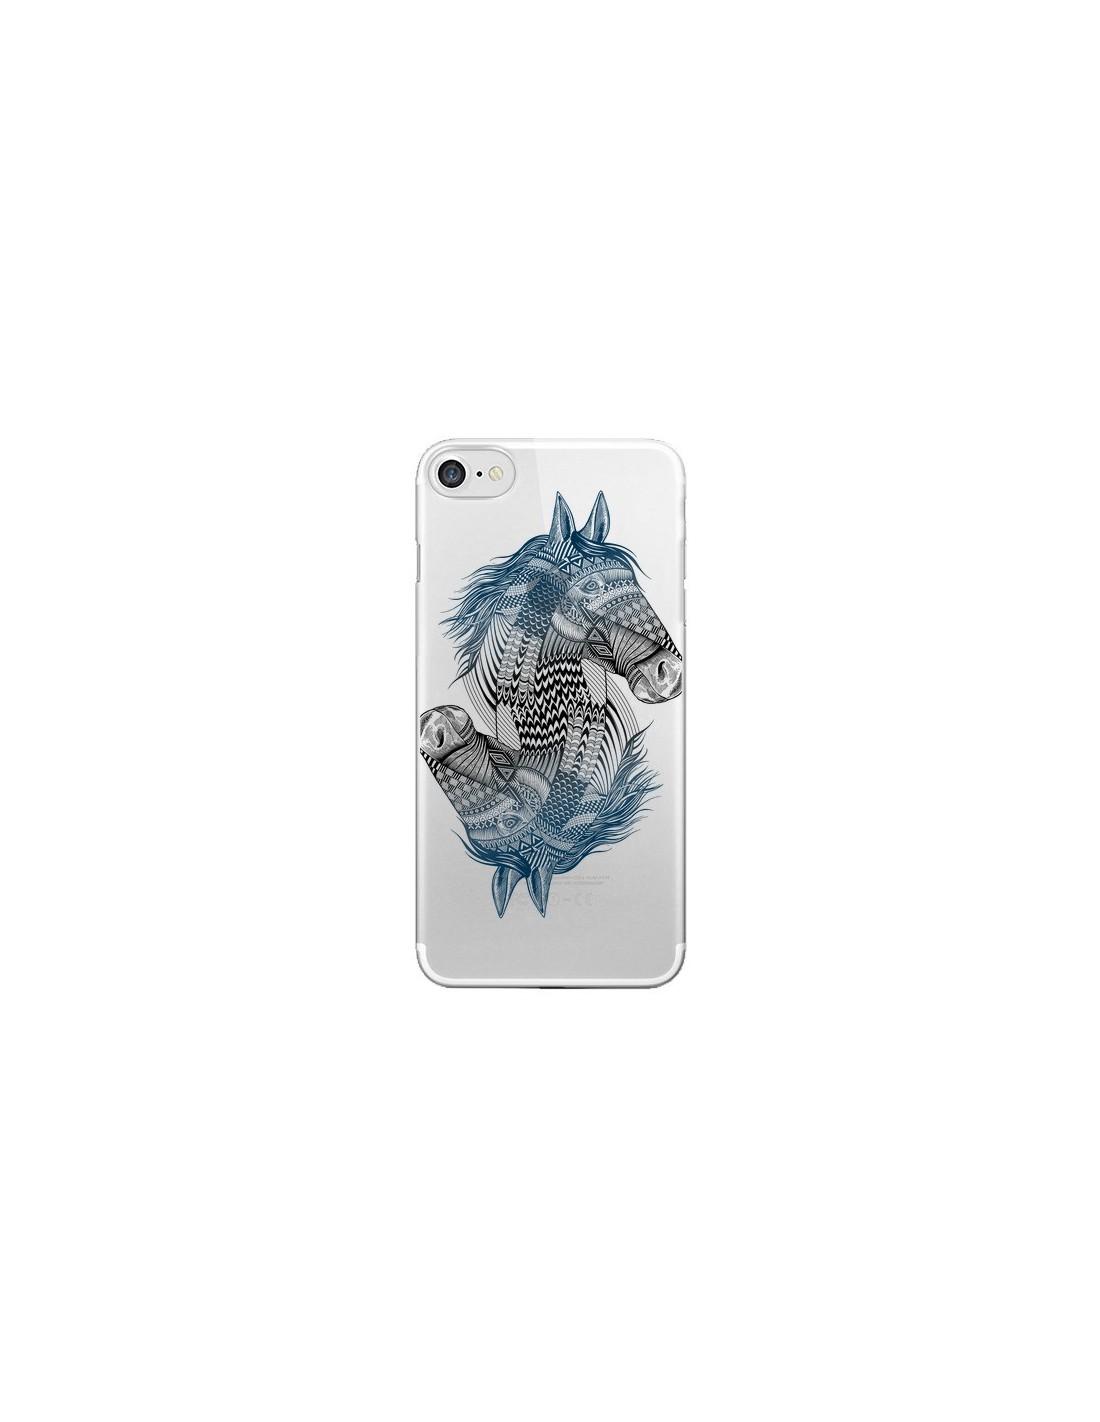 coque iphone 7 8 se 2020 cheval horse double transparente rachel caldwell